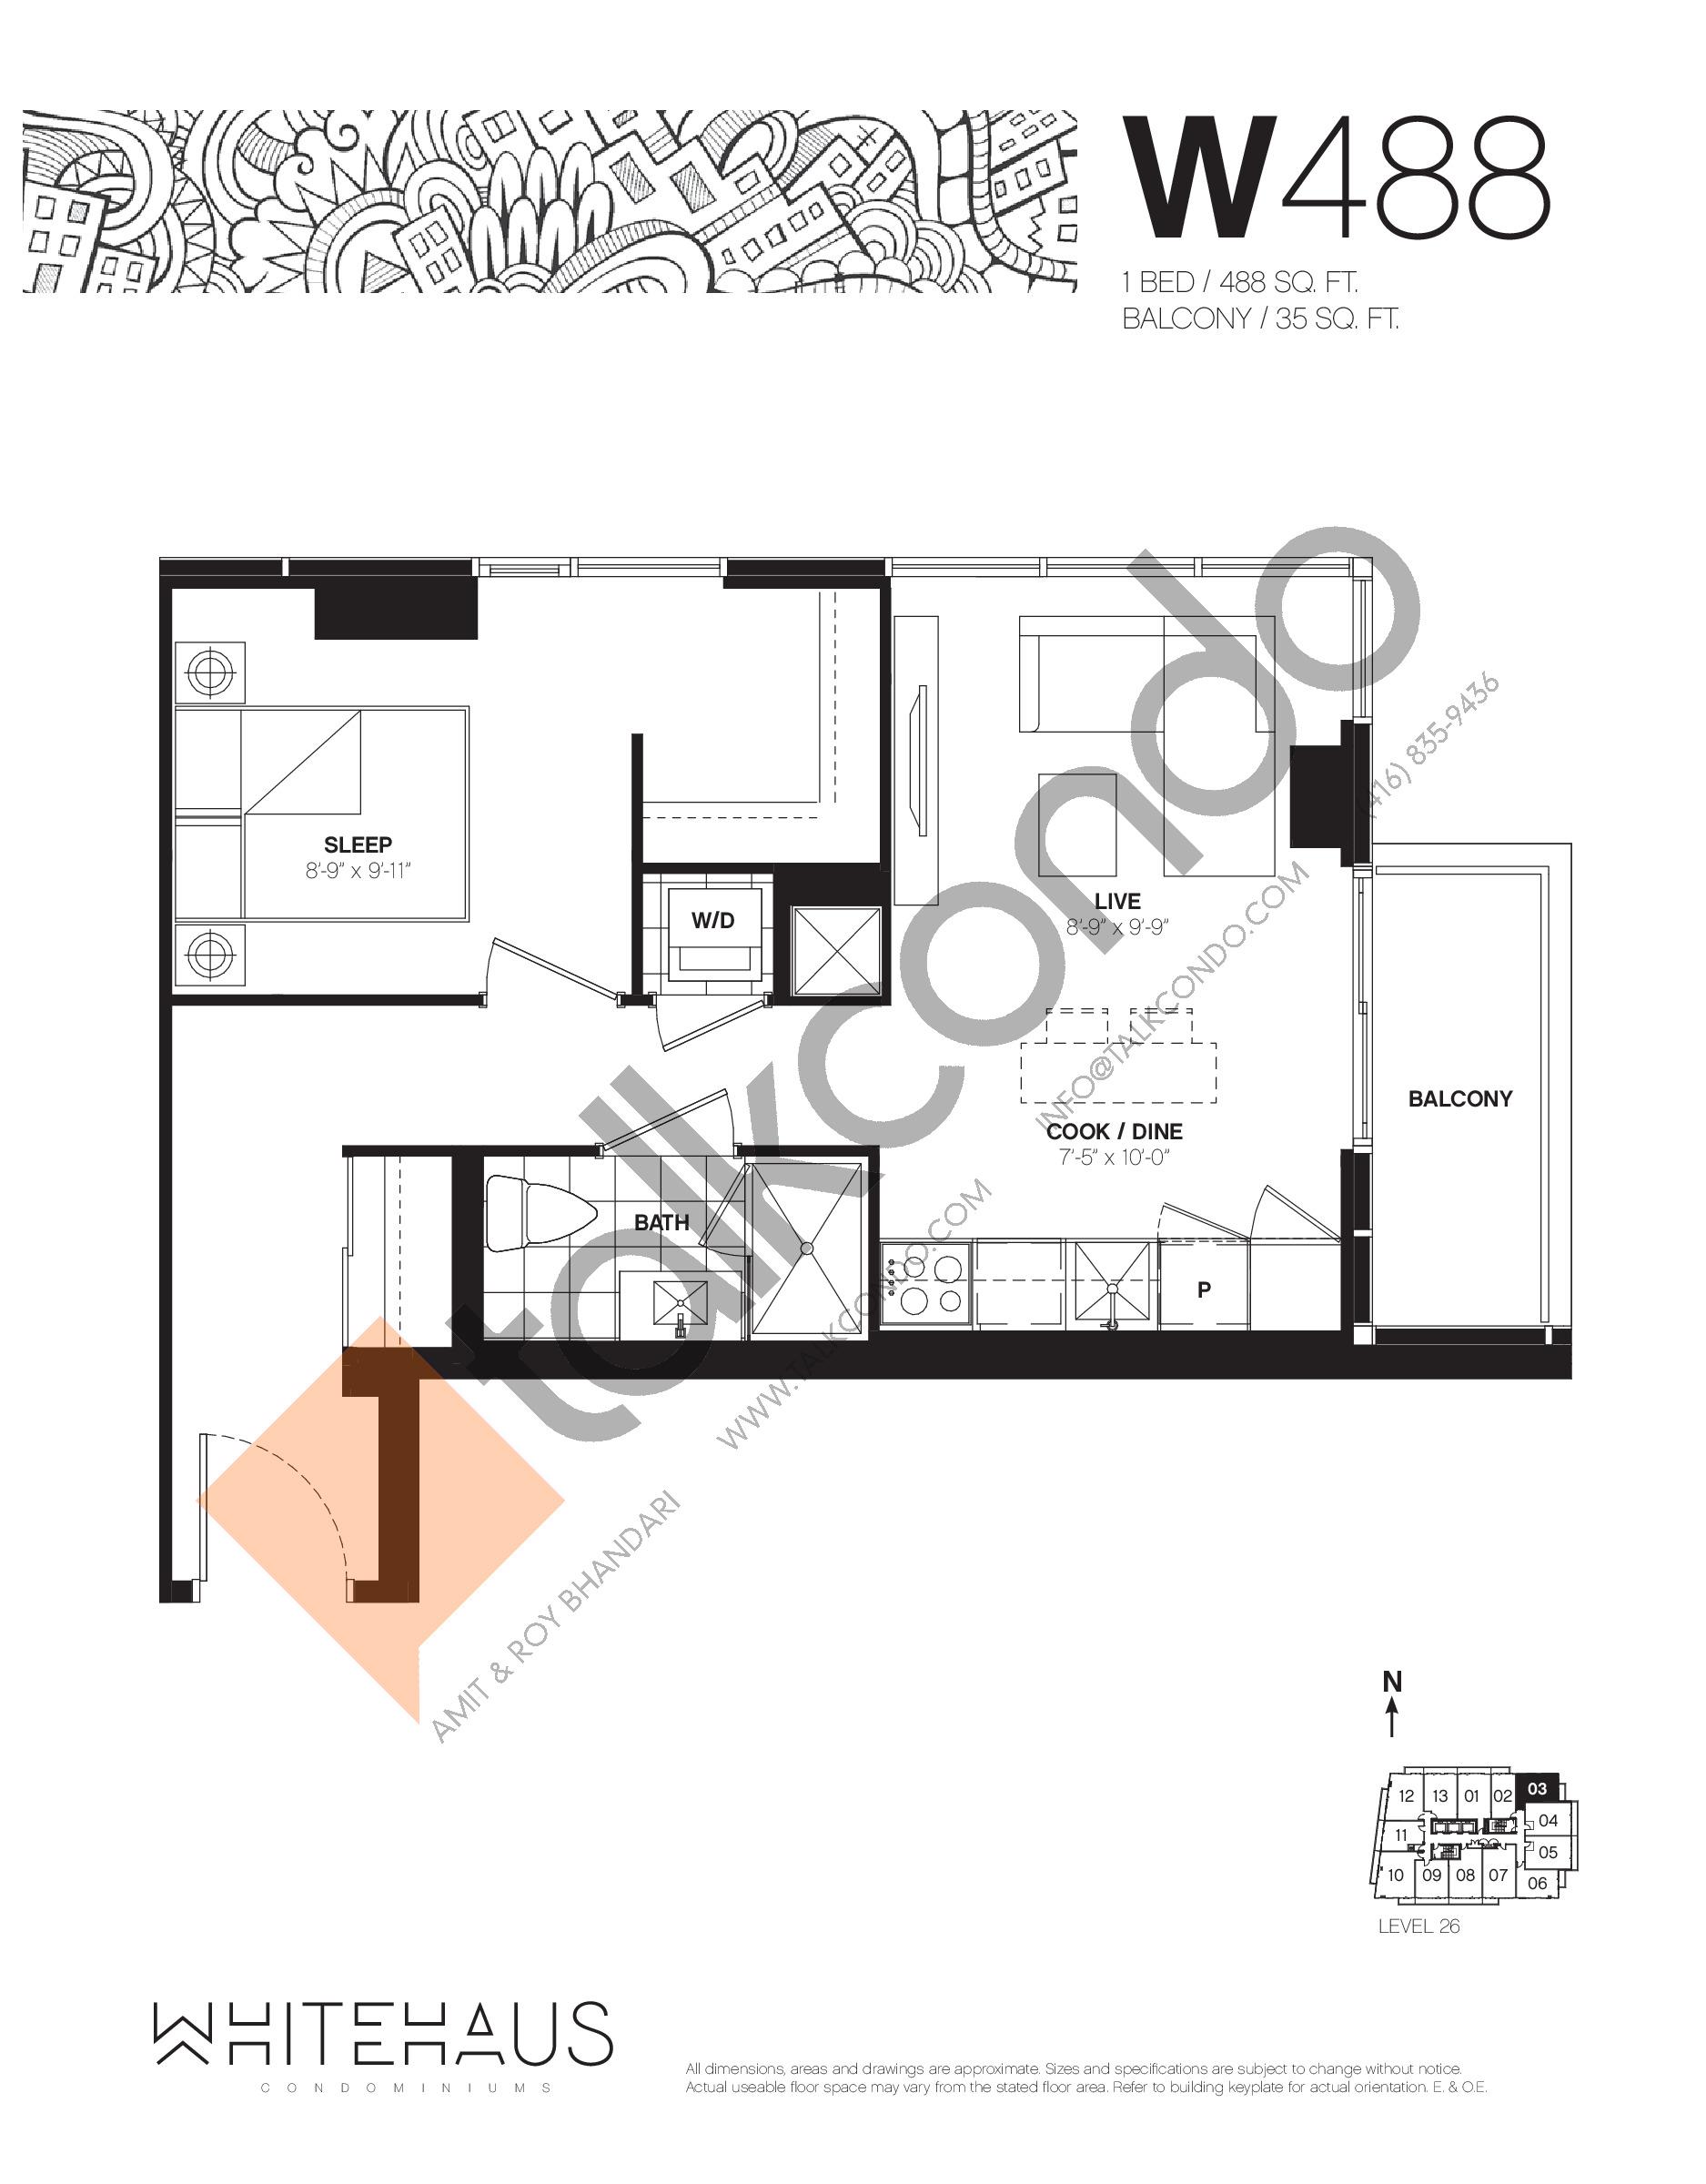 W488 Floor Plan at Whitehaus Condos - 488 sq.ft